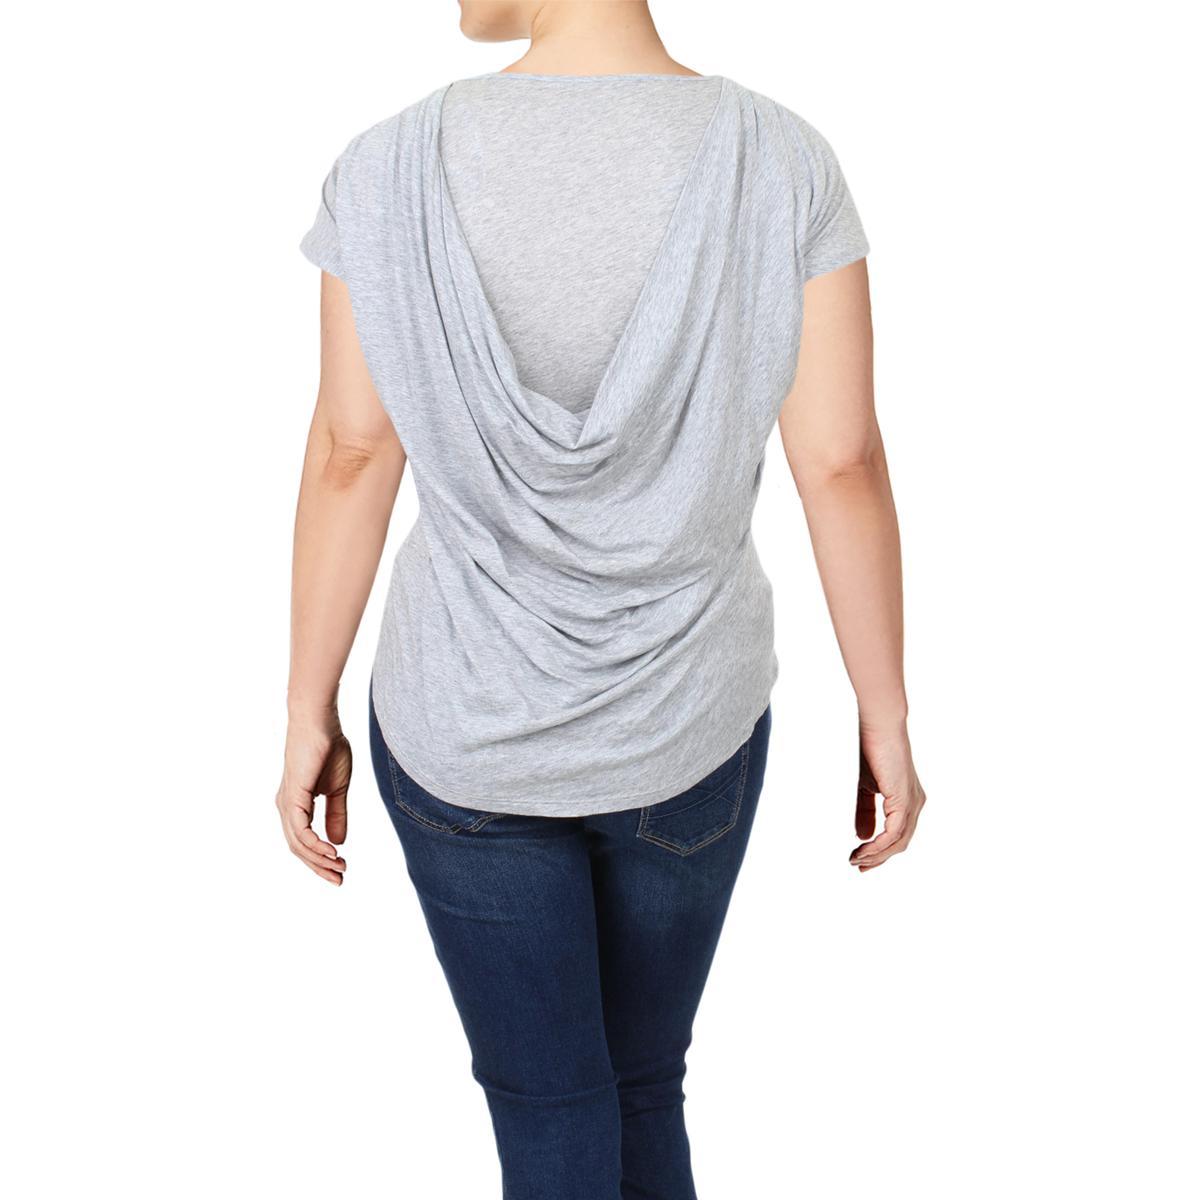 Marc New York Womens Gray Heathered Layered Casual Top Shirt Plus 2X BHFO 7343